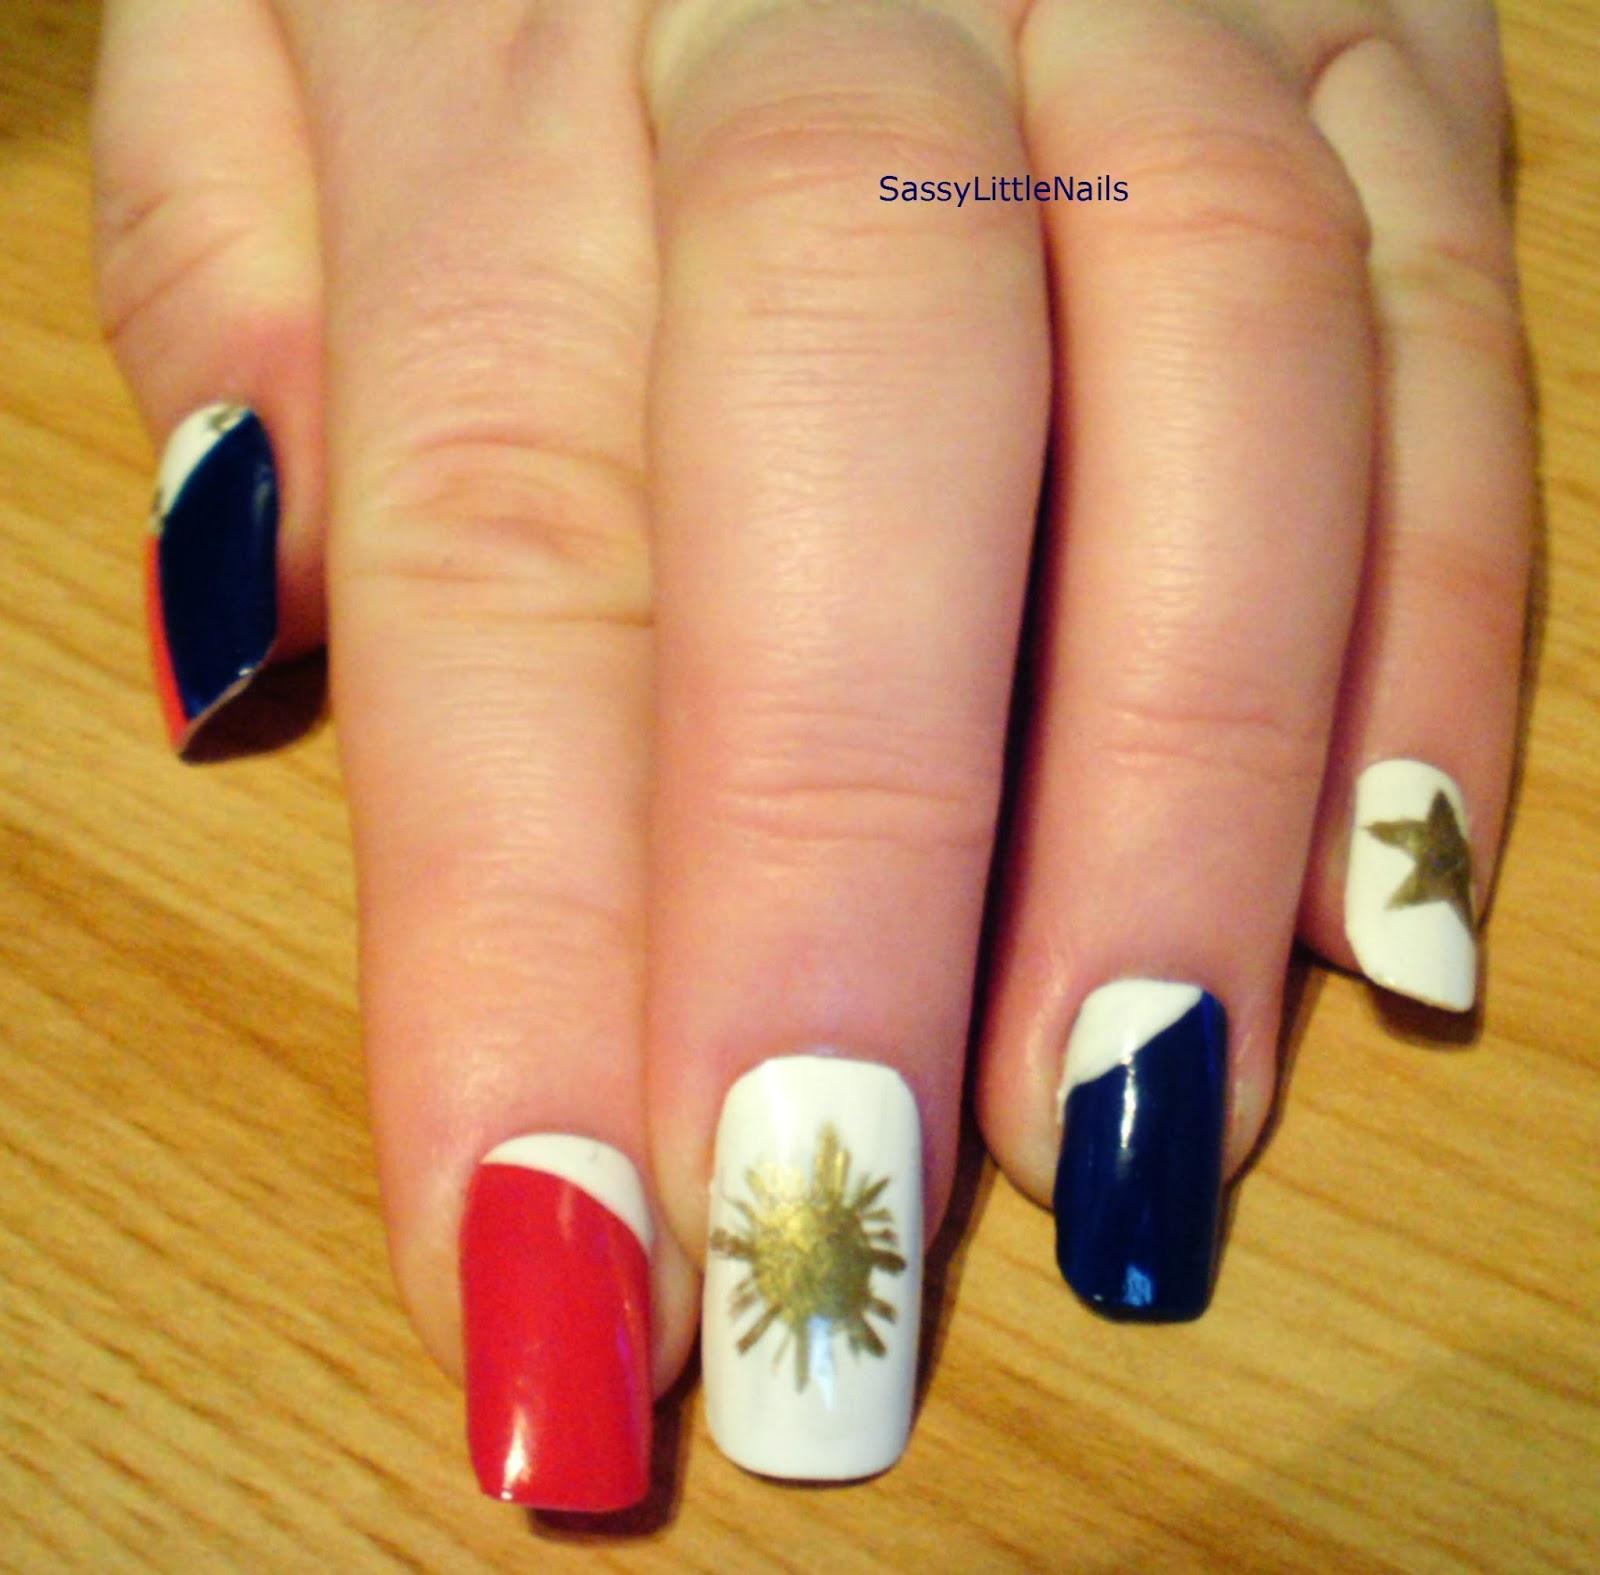 SassyLittleNails: Philippines Flag Nail Art For The